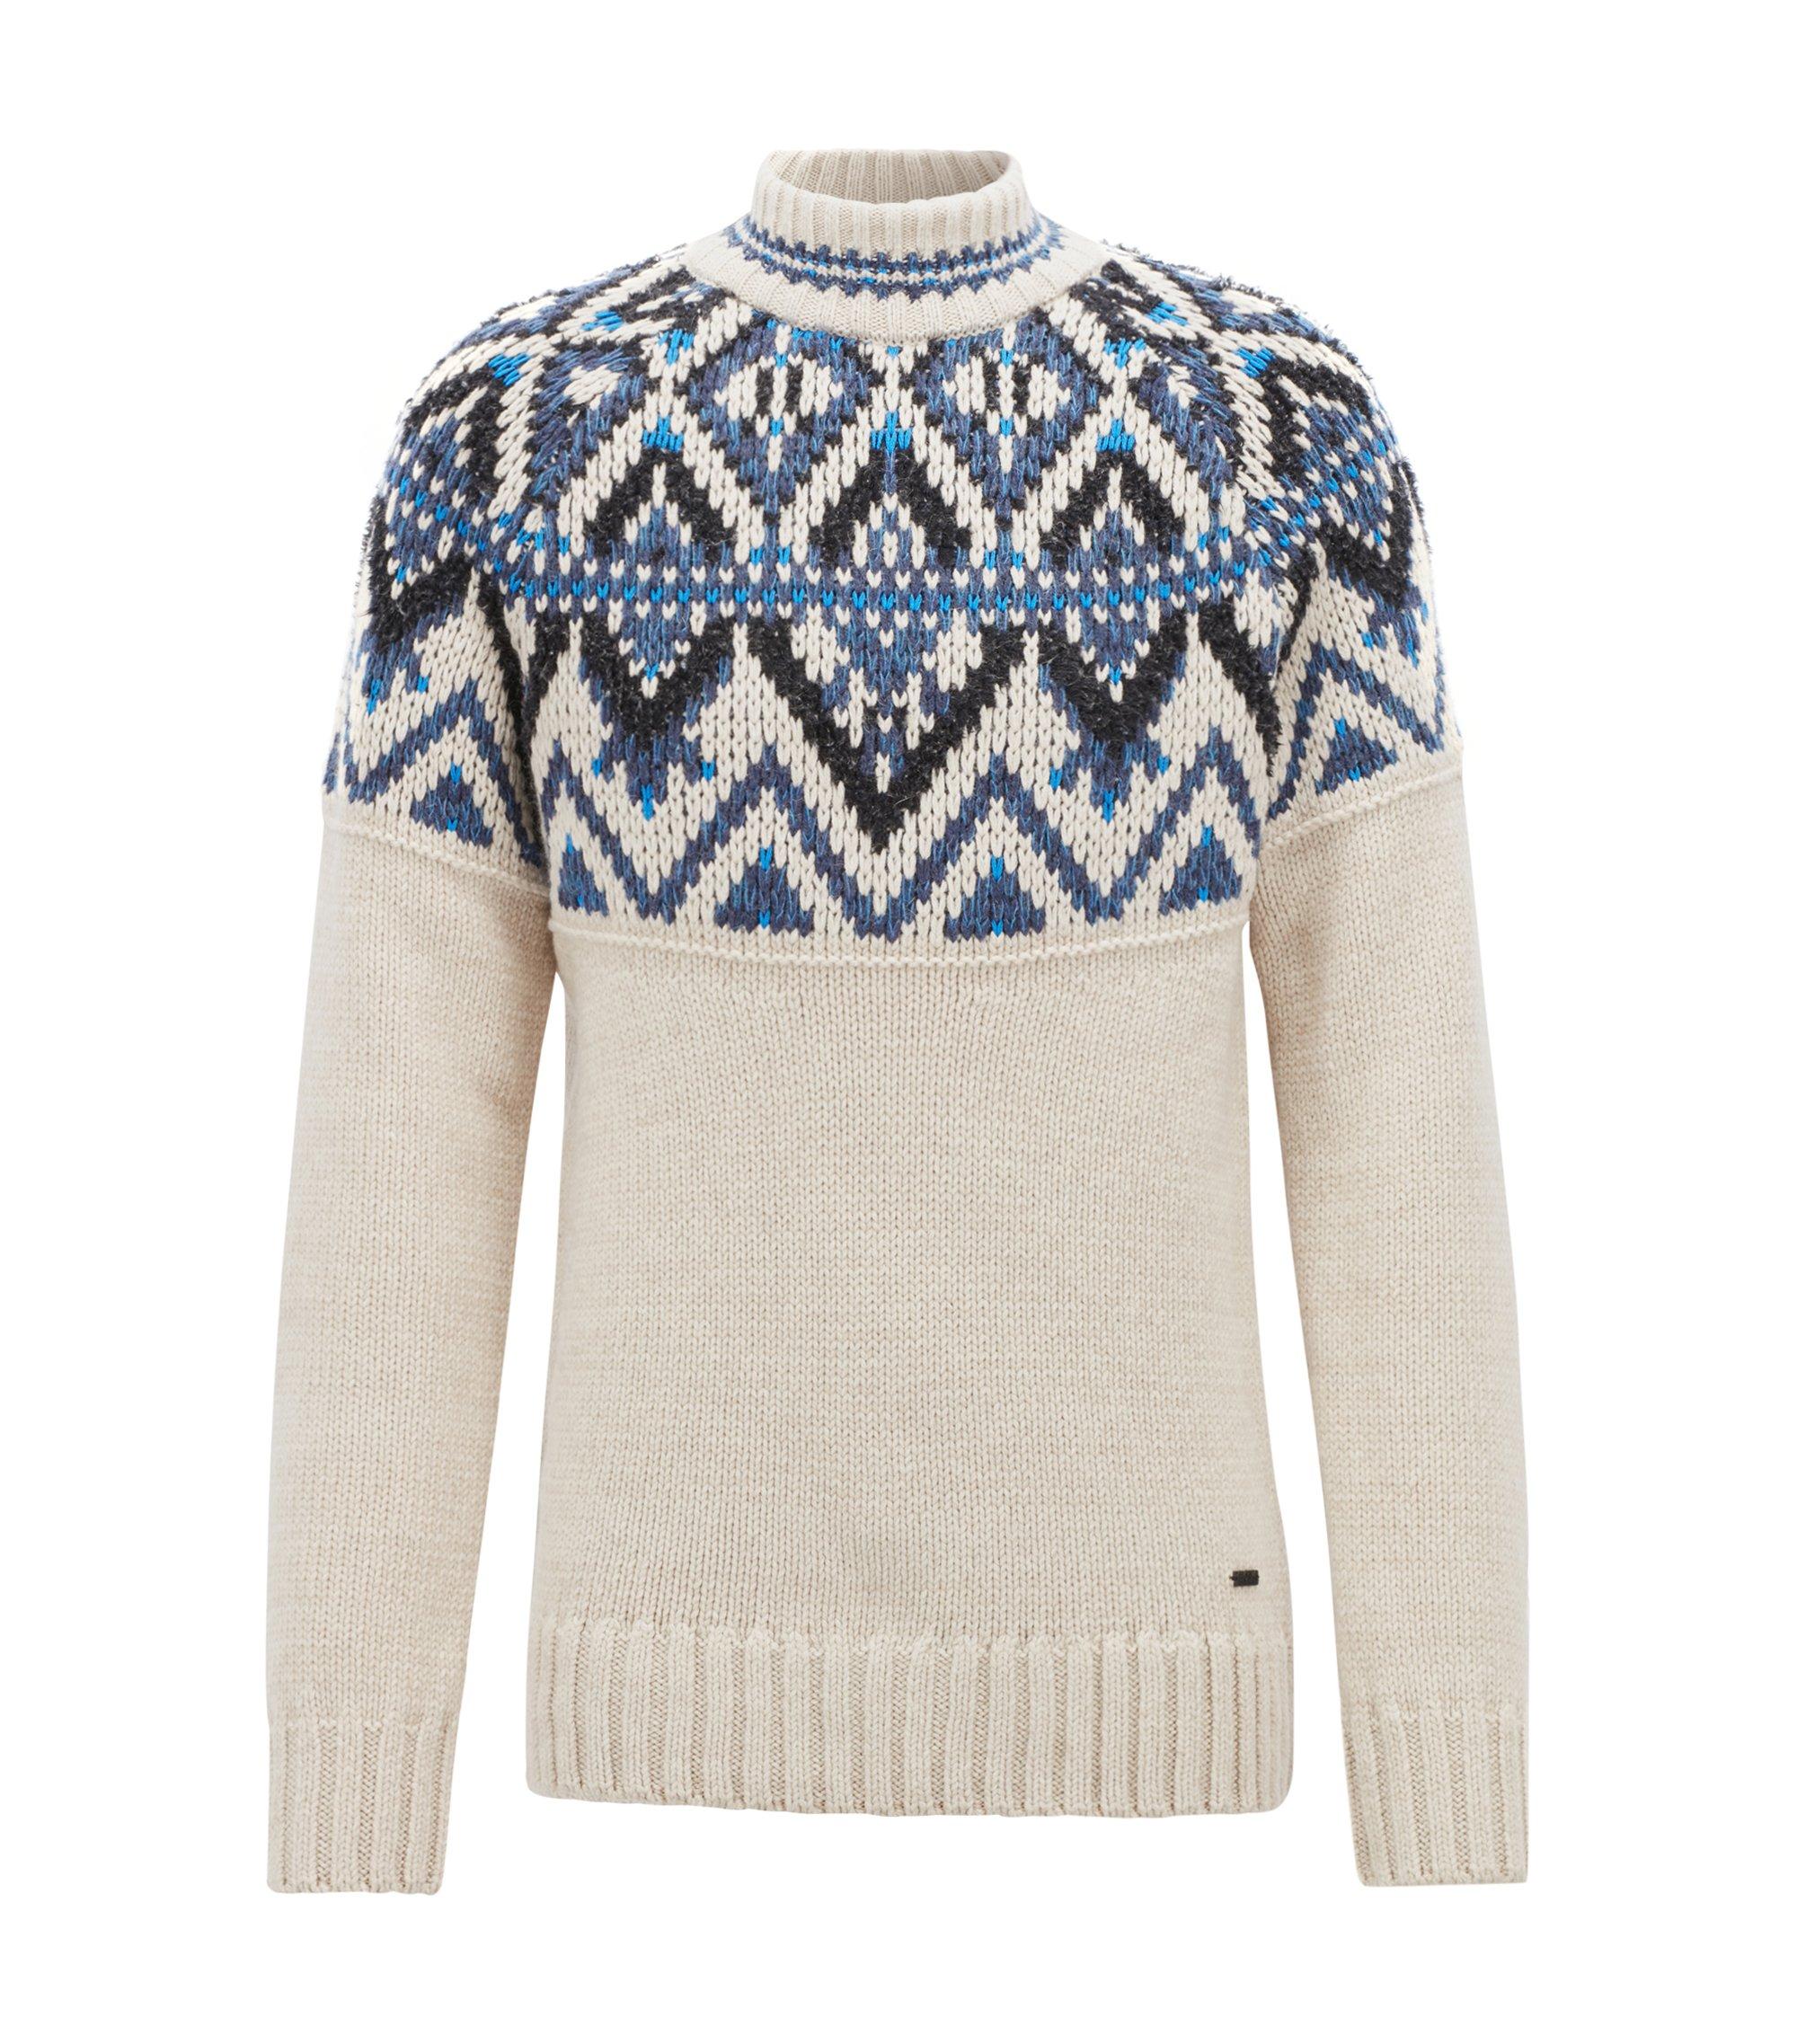 Fair Isle sweater in textured bouclé yarn, Open Beige